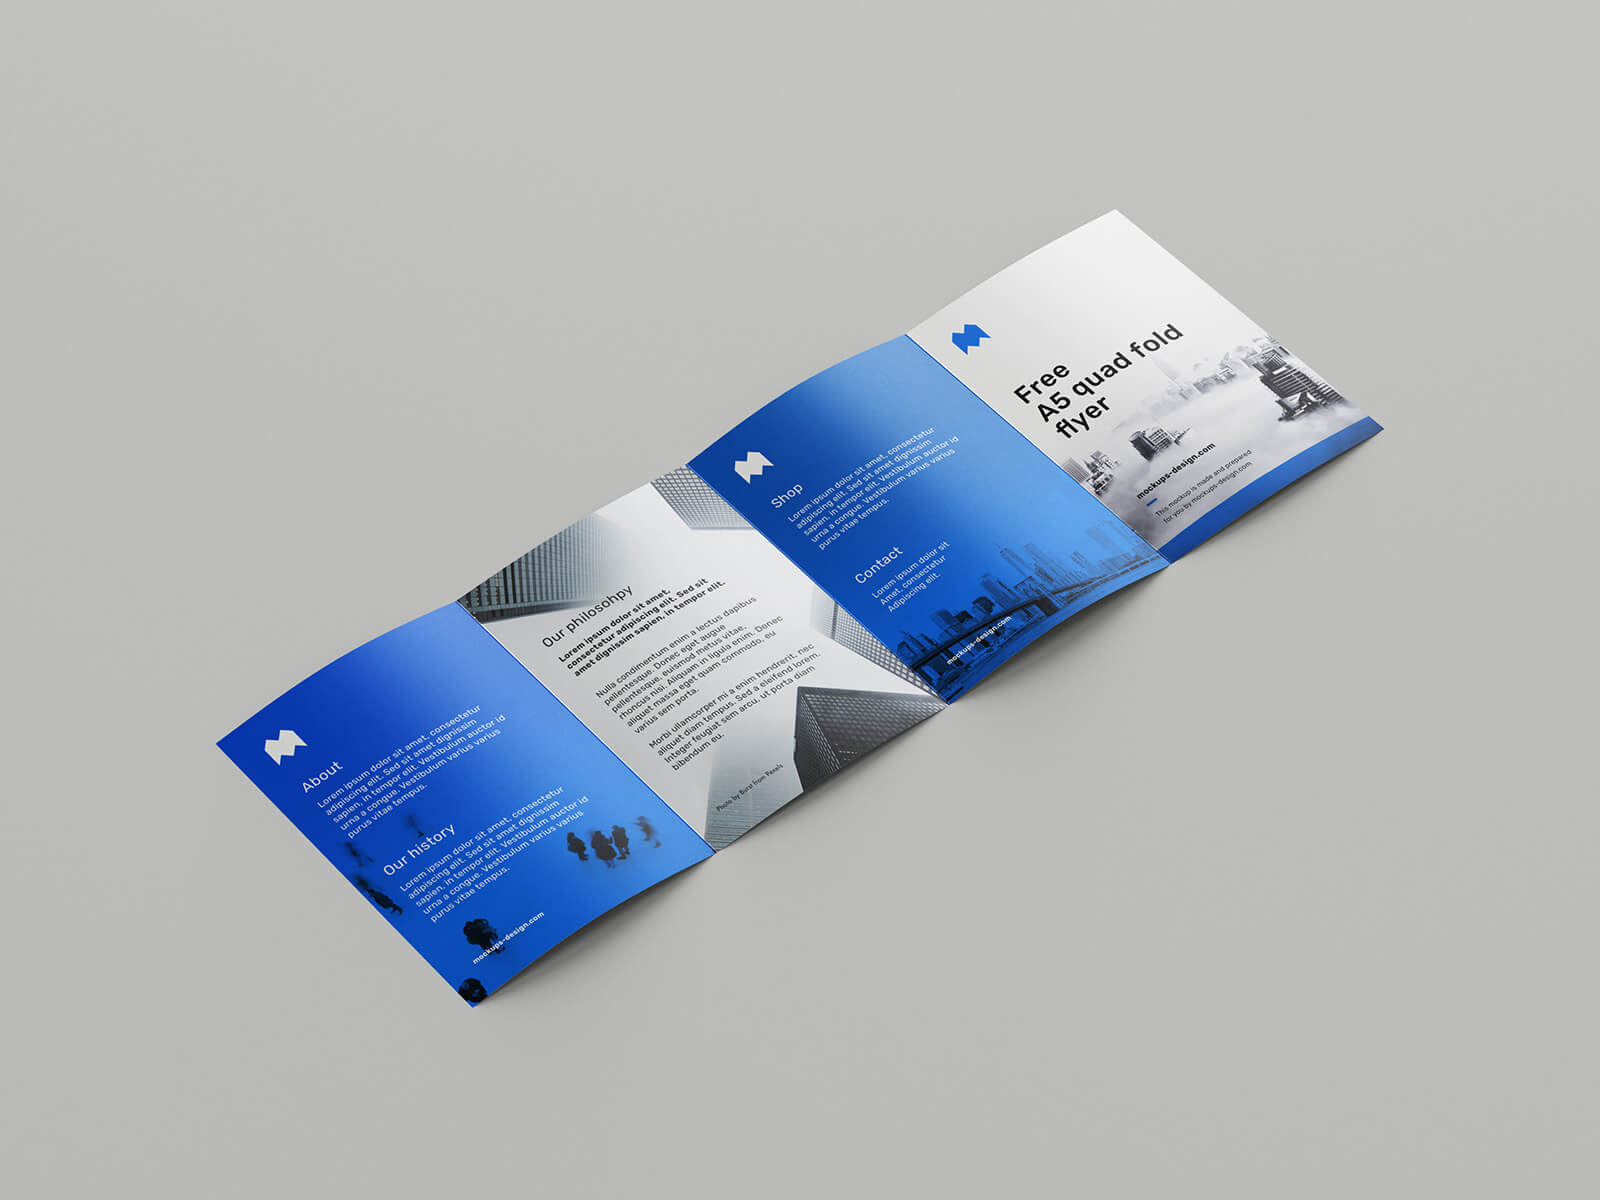 Free Blue A5 Quad Fold Flyer Mockup PSD Template (1)